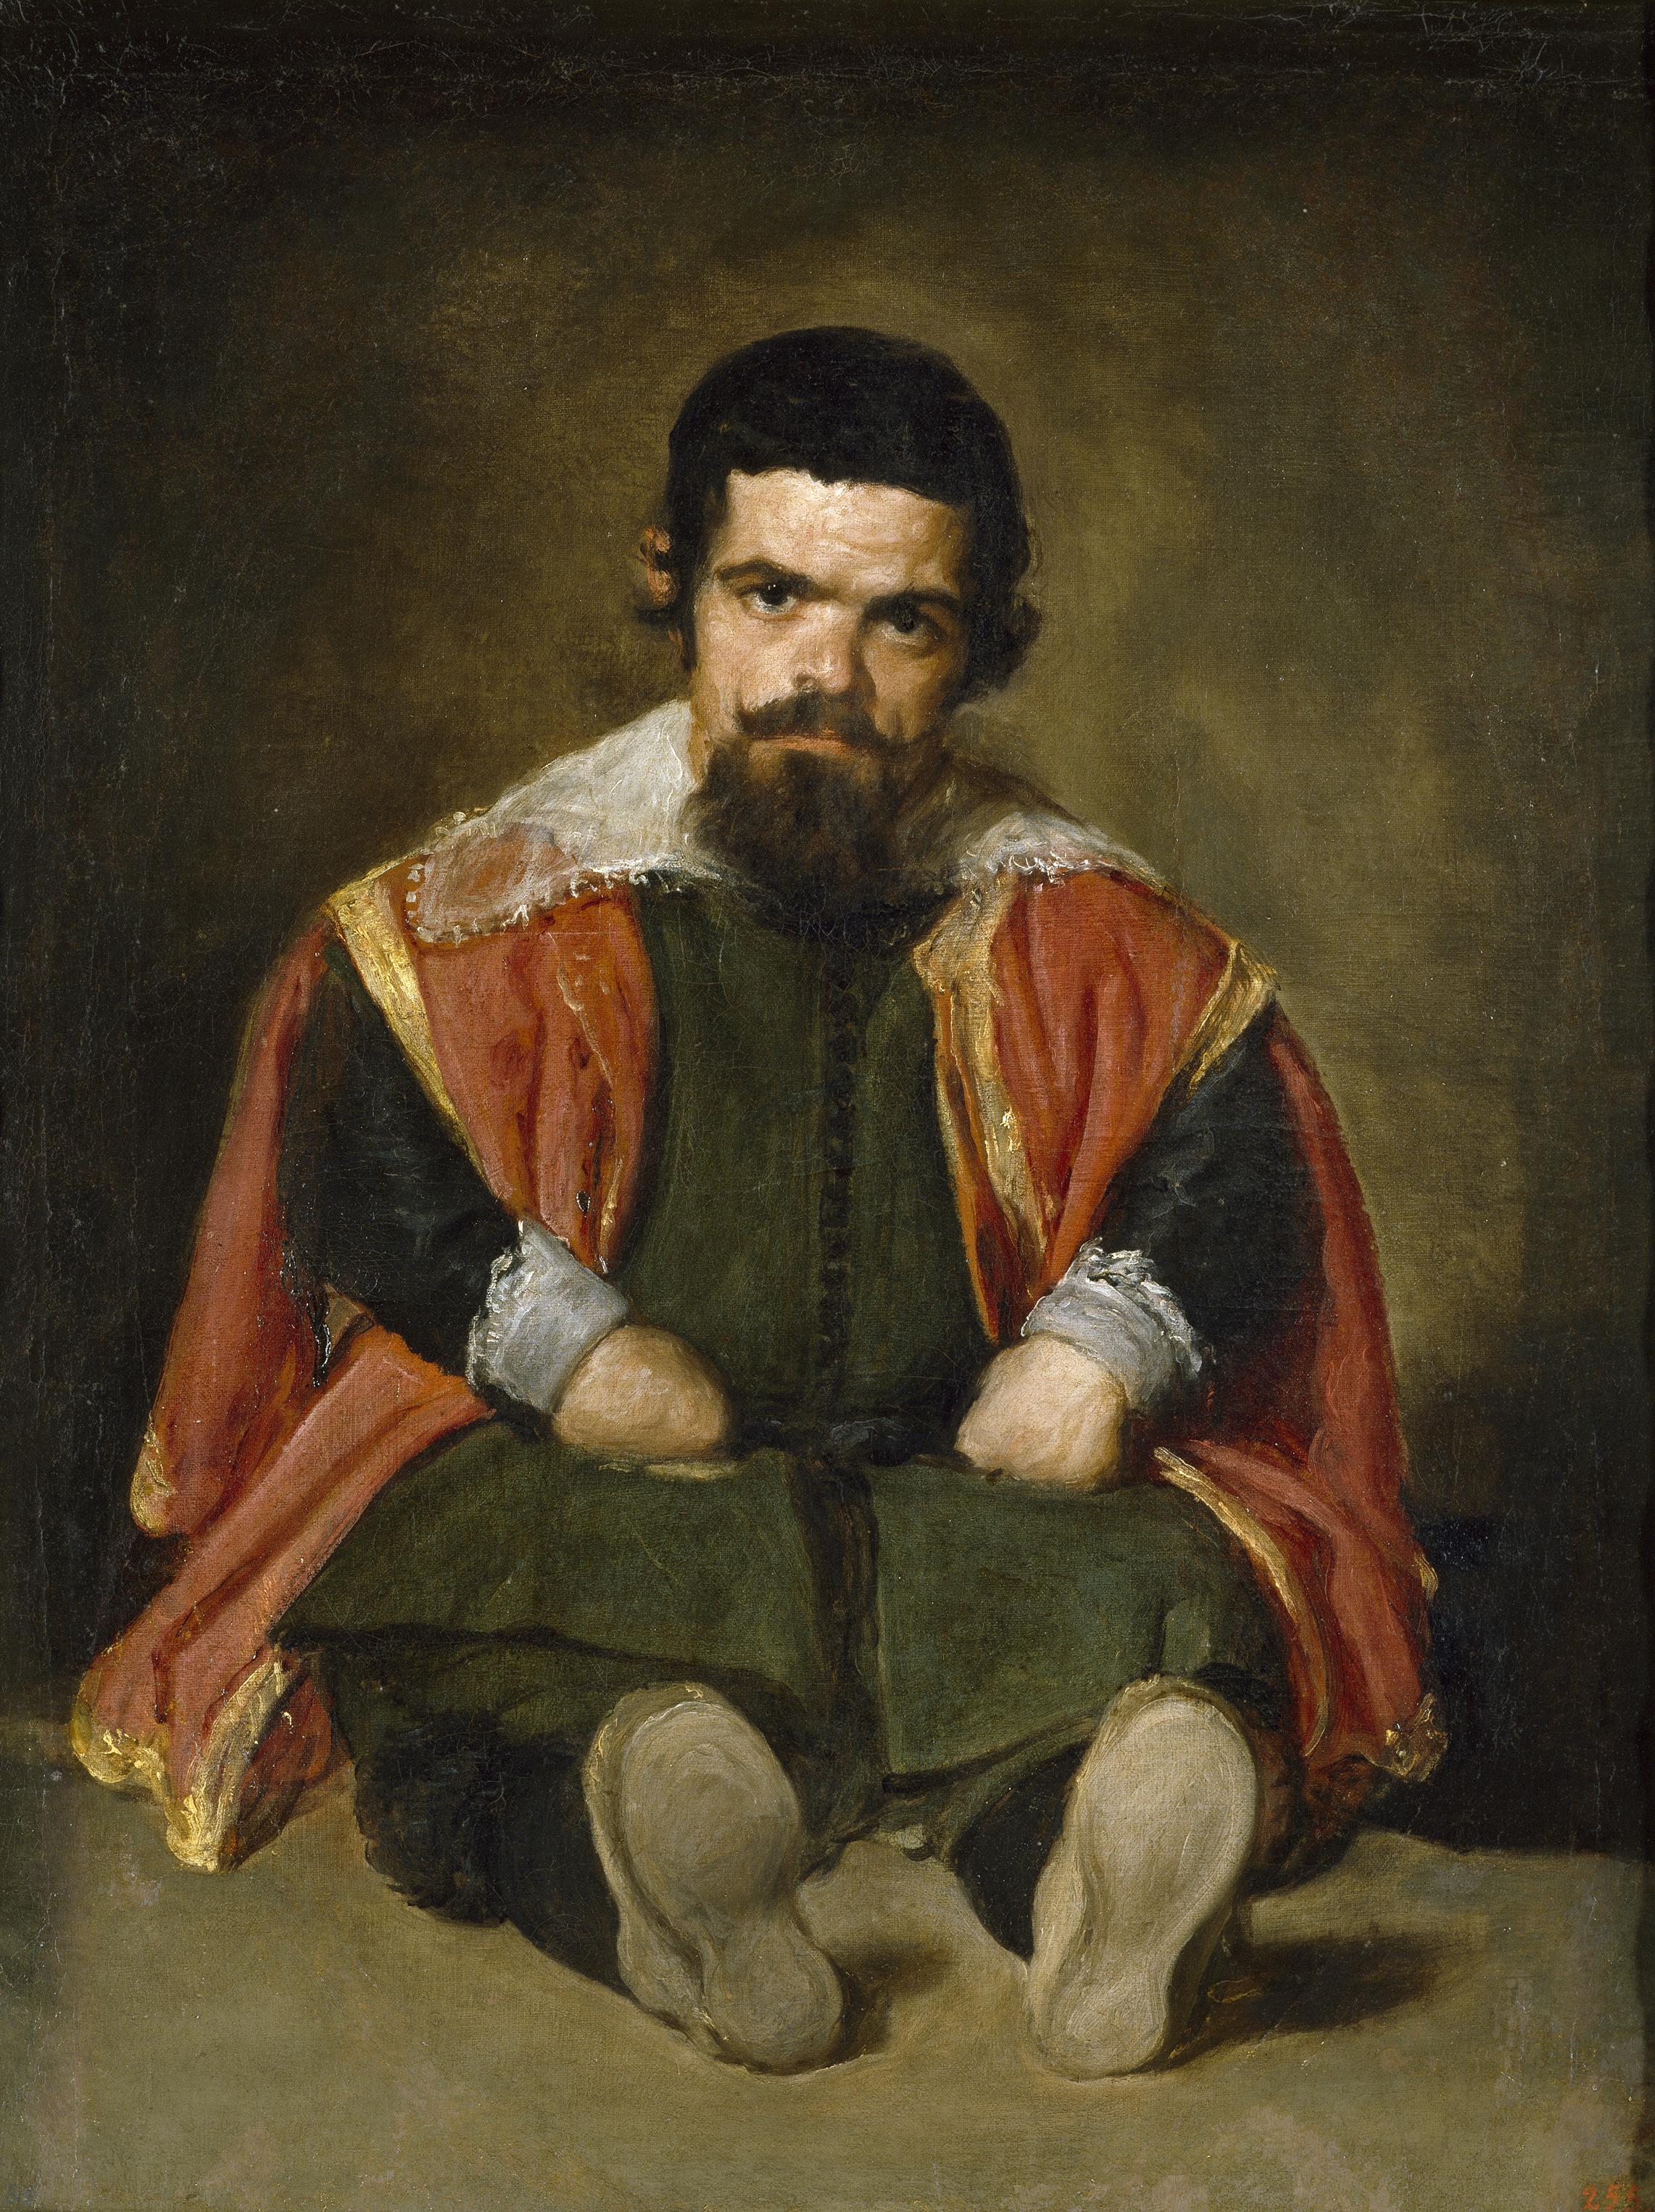 http://upload.wikimedia.org/wikipedia/commons/d/d4/Vel%C3%A1zquez_%E2%80%93_Buf%C3%B3n_don_Sebasti%C3%A1n_de_Morra_(Museo_del_Prado,_c._1645).jpg